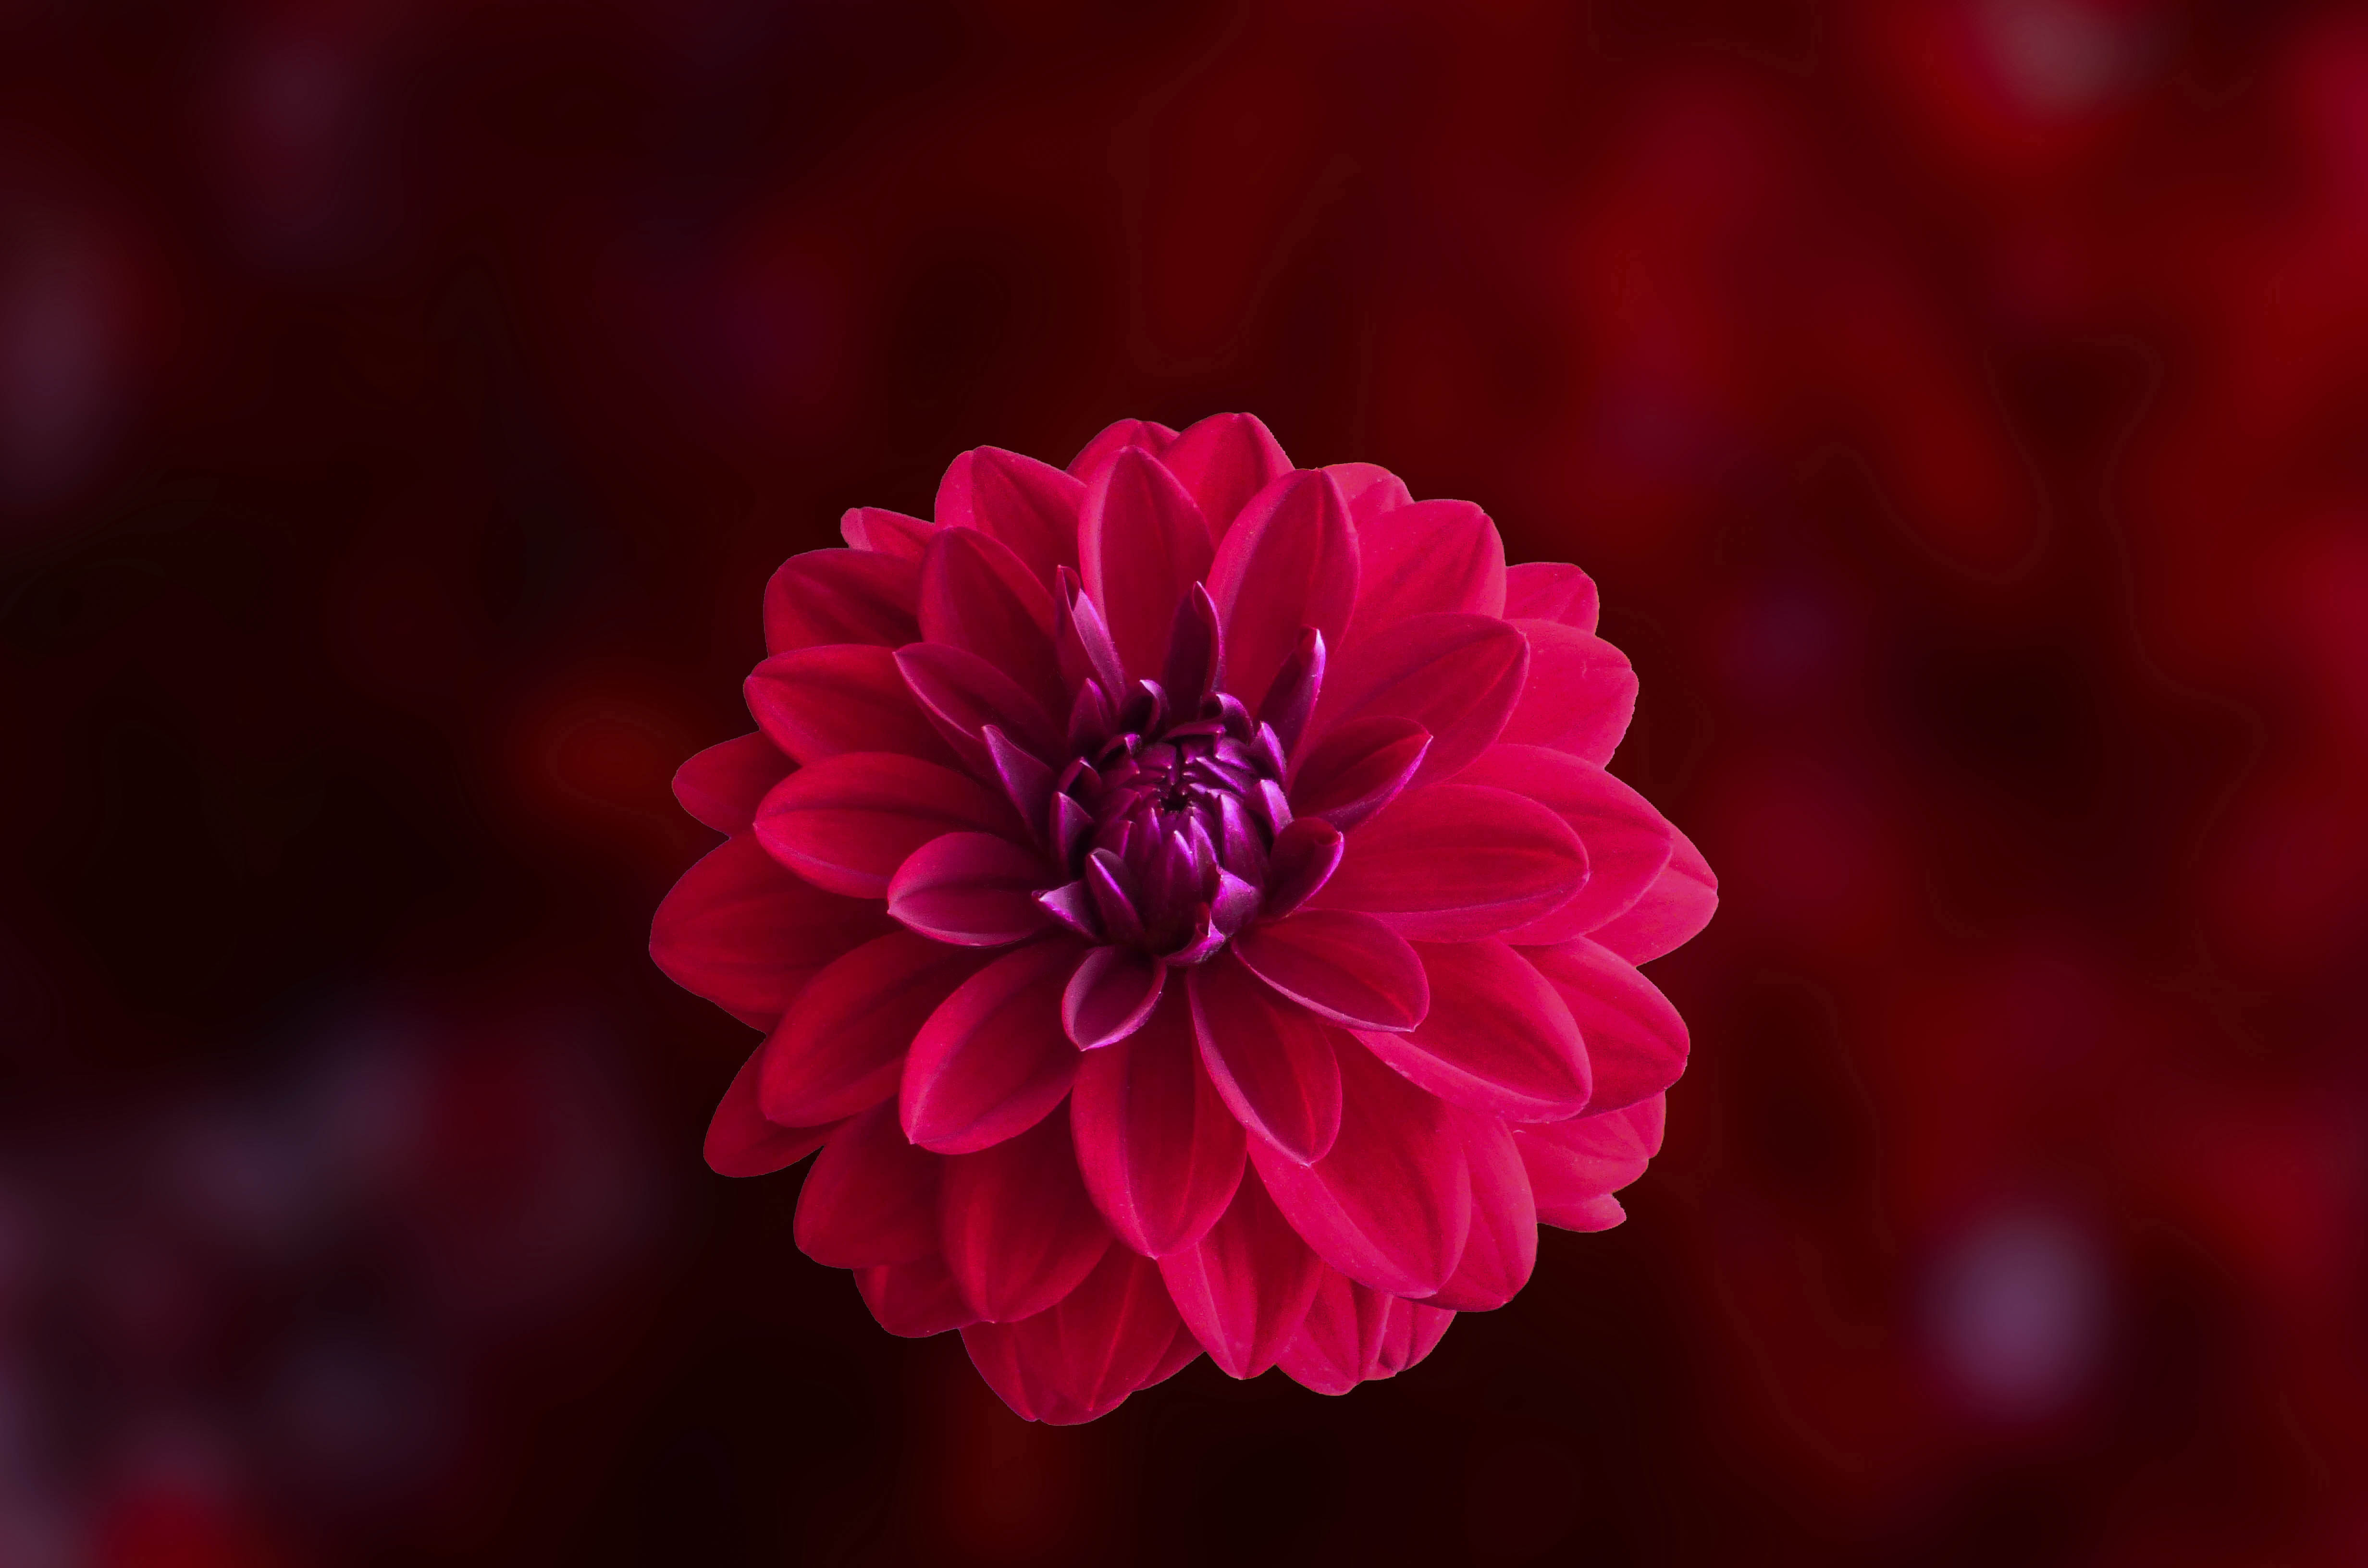 pink dahlia flower 4k 1606512712 - Pink Dahlia Flower 4k - Pink Dahlia Flower 4k wallpapers